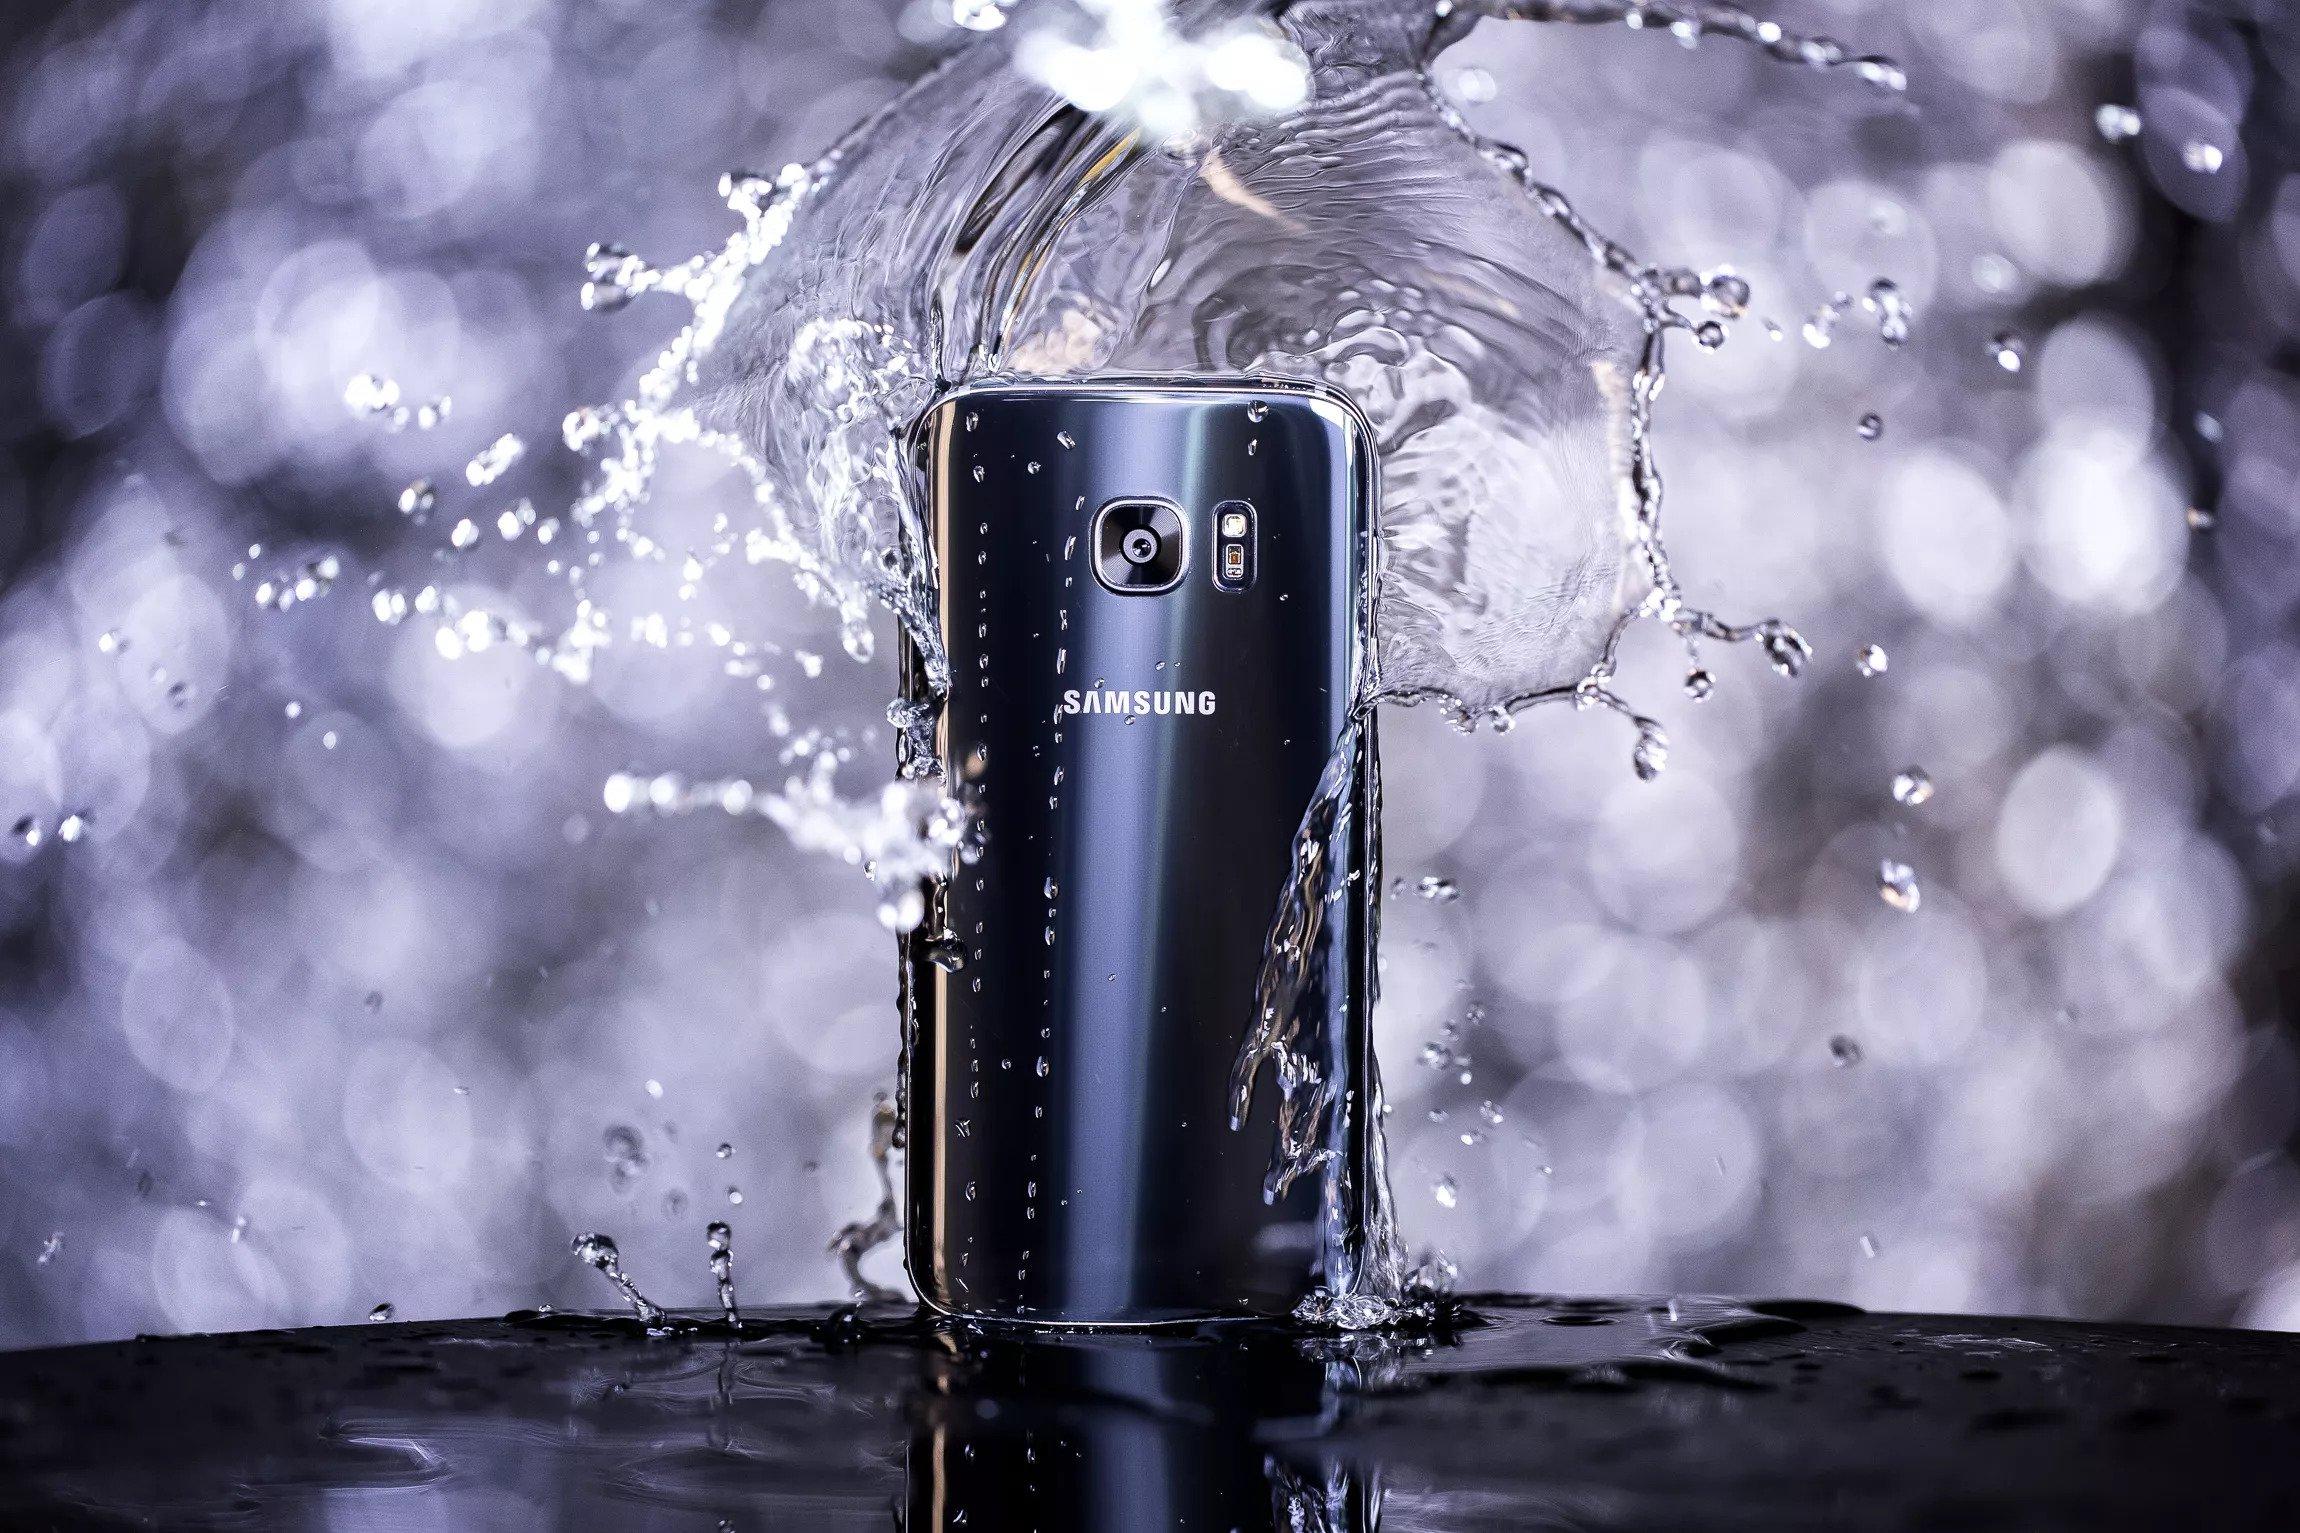 Background image for Samsung Rewards, the loyalty program of Samsung.